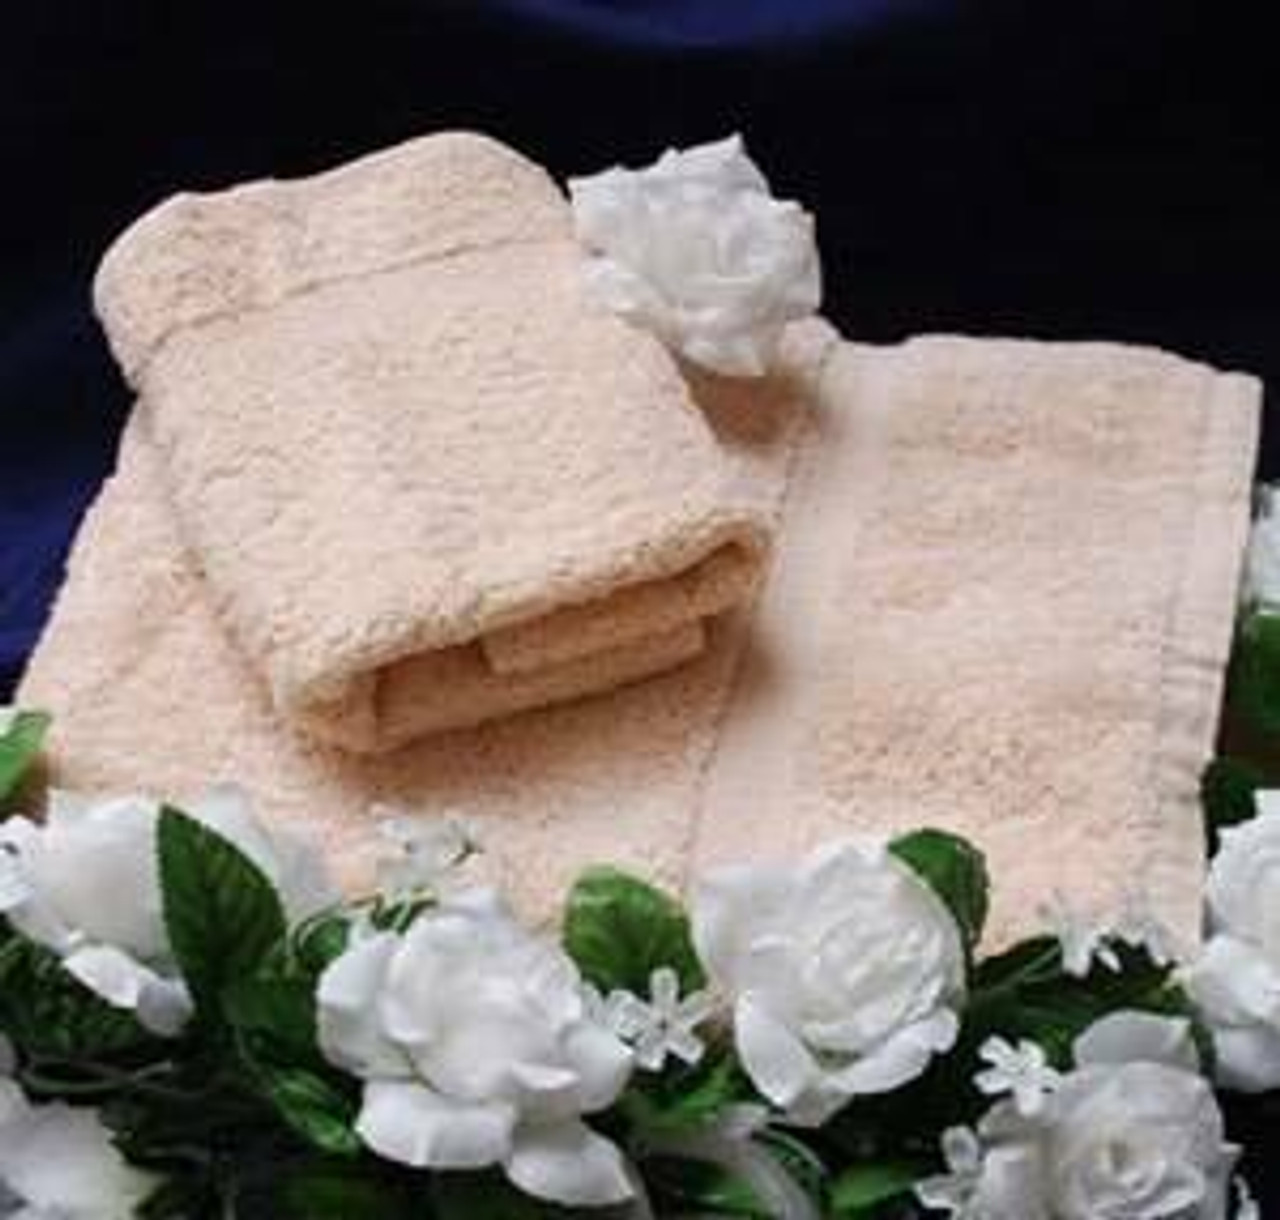 THOMASTON MILLS Royal Suite Dobby Towels by Thomaston Mills